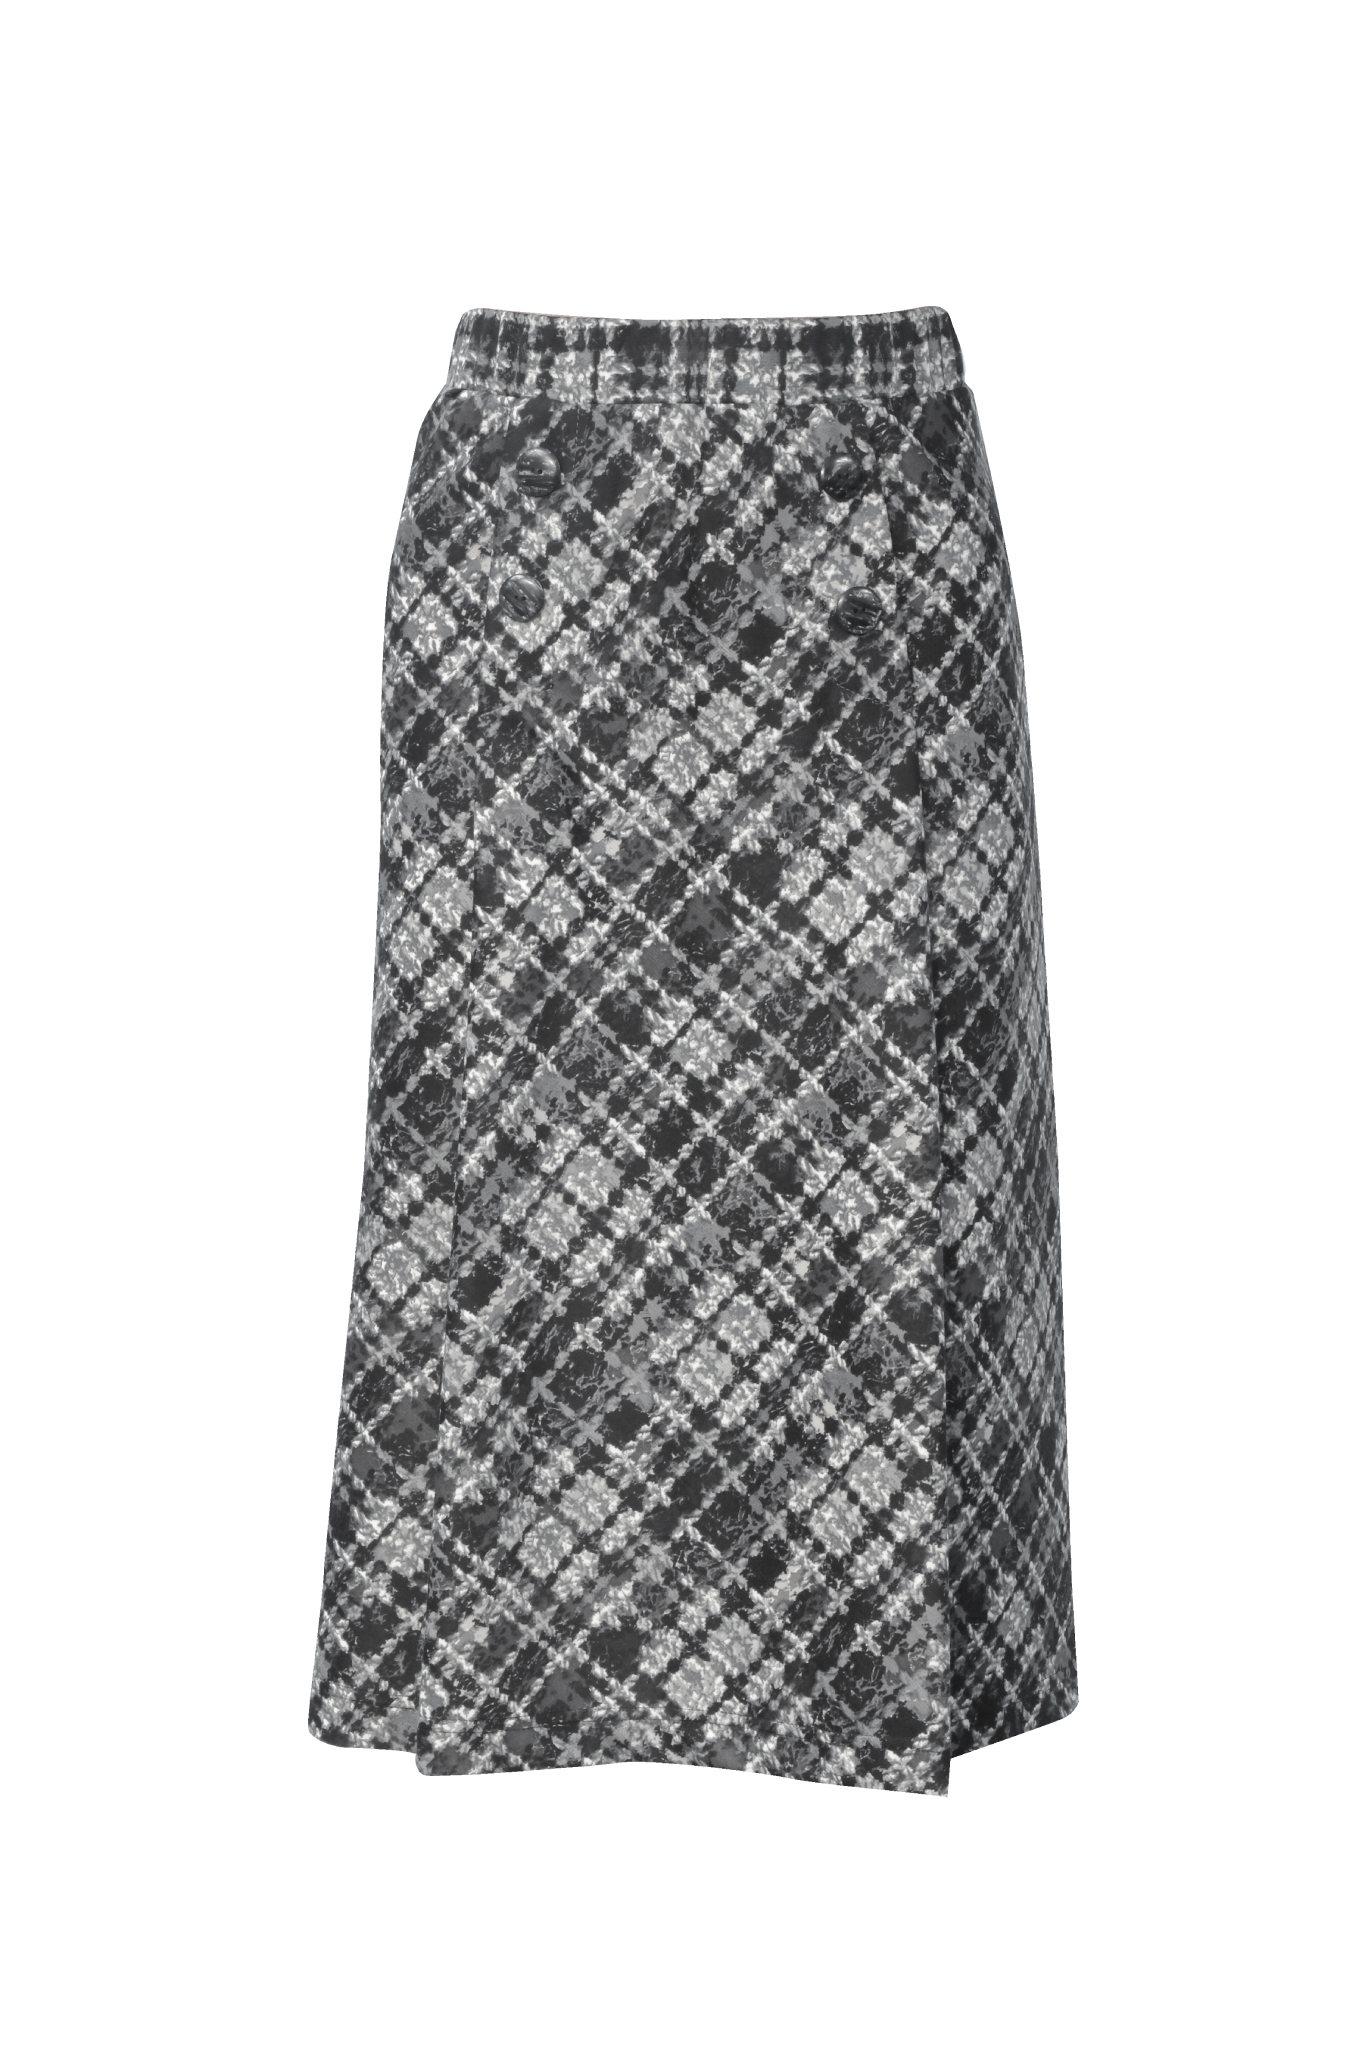 989 Jumitex dzianinowa spodnica na gumie